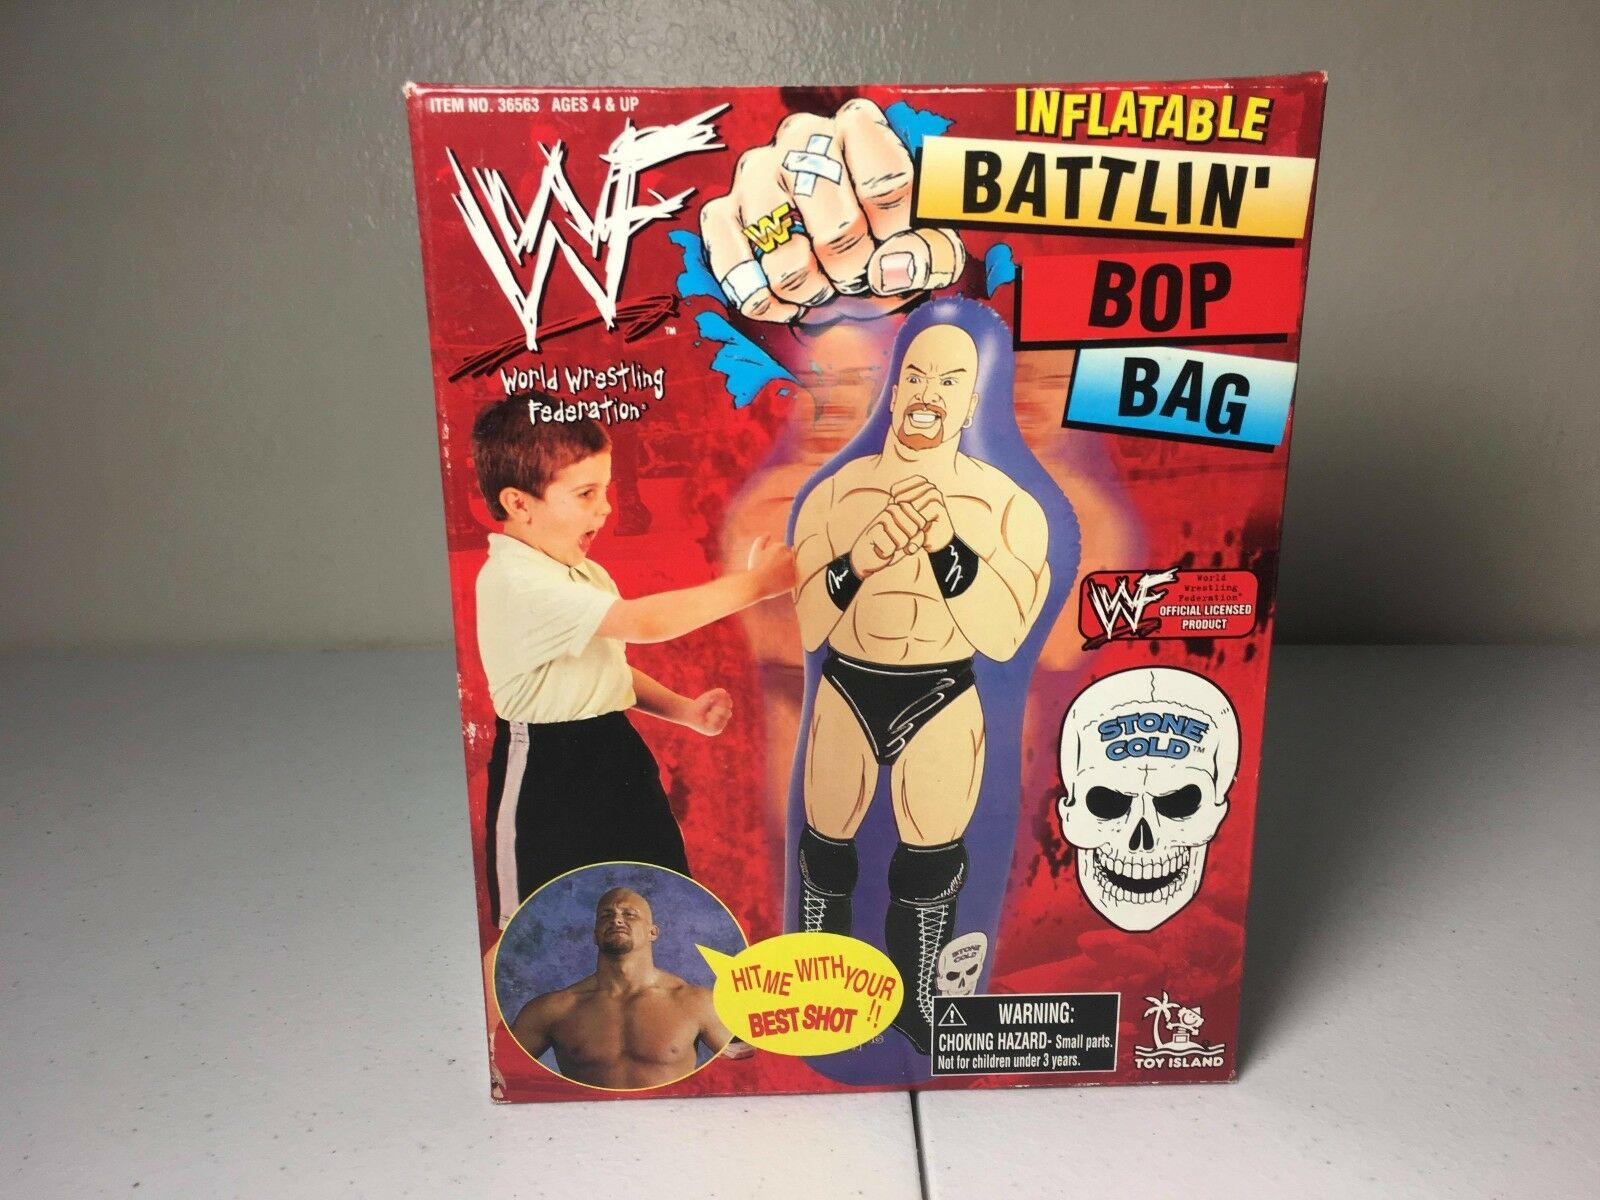 WWF WWE 1999 Stone Cold Steve Austin - Battlin Bop Bag Inflatable Large NIB